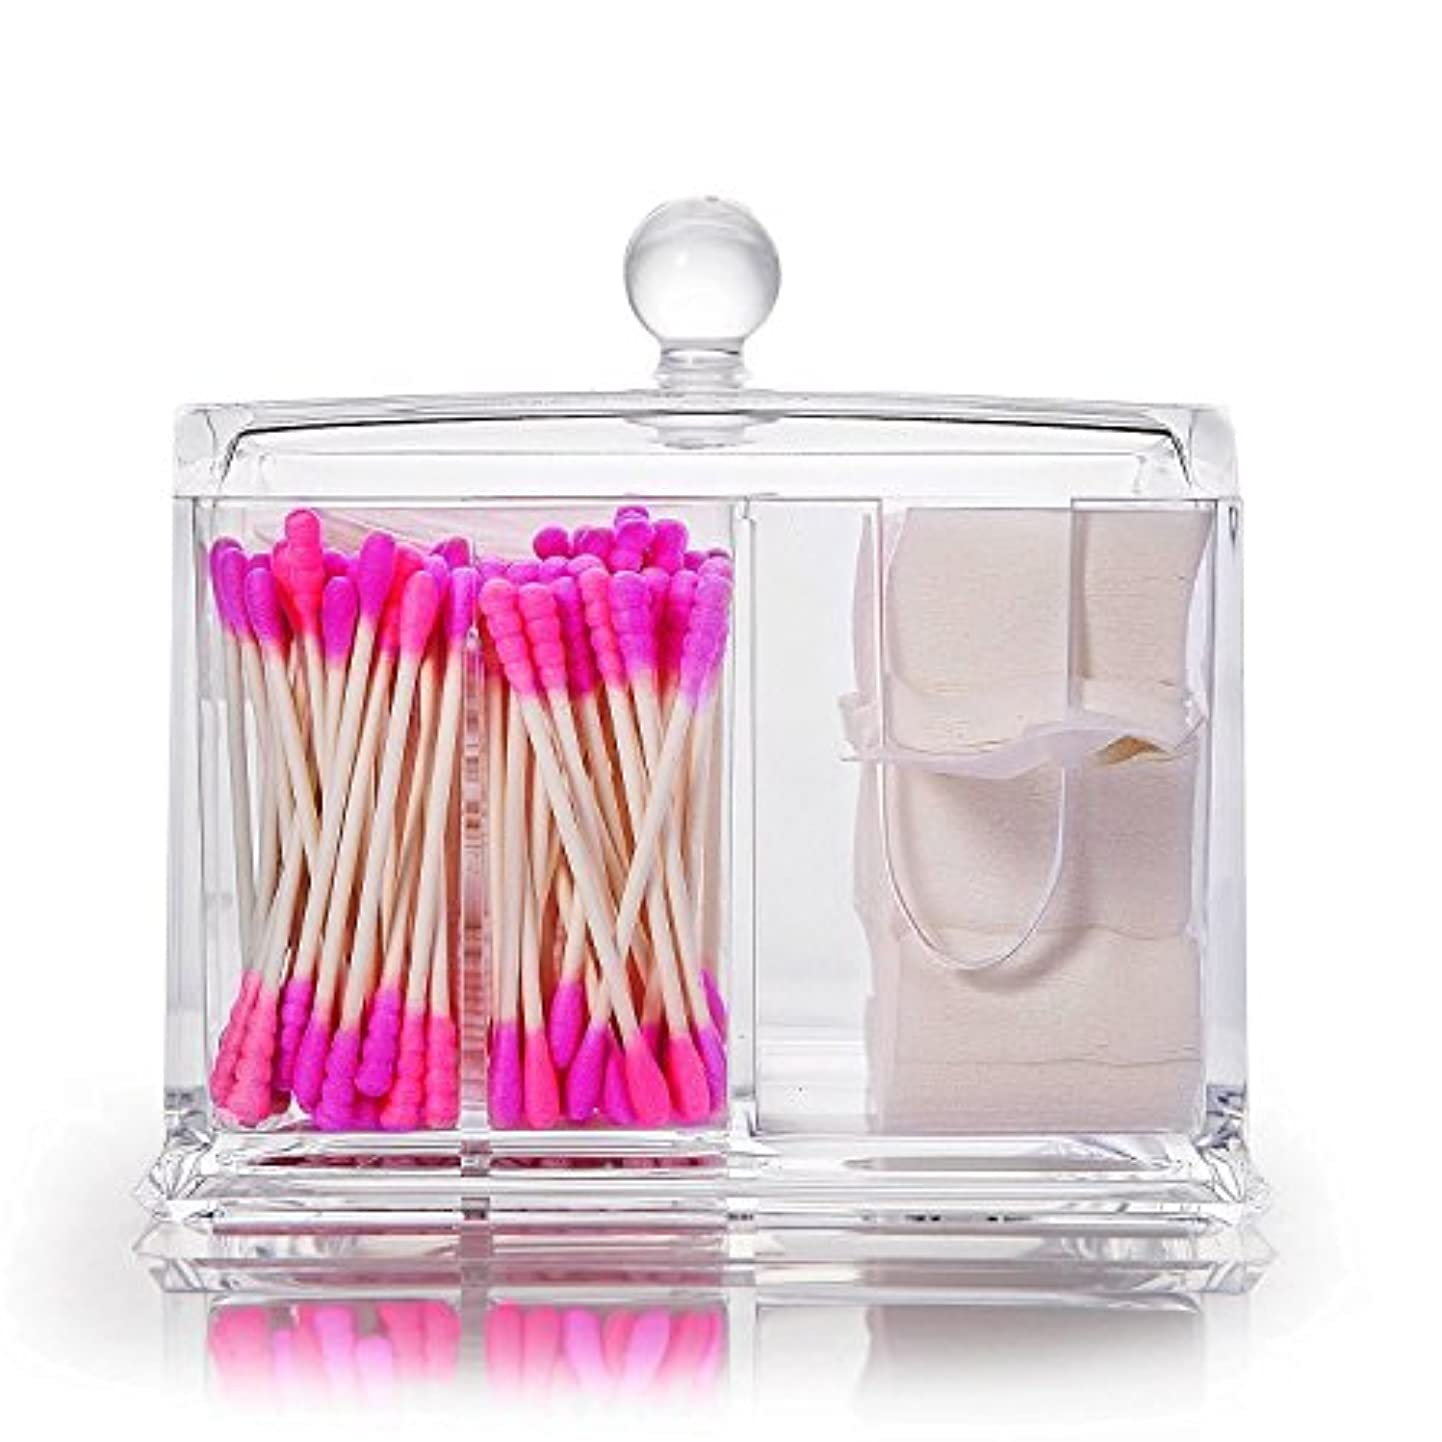 Neolly 綿棒ケース コスメボックス 収納ケース 蓋付き 小物入れ 綿棒入れ 化粧品 多機能 収納ボックス メイクケース ジュエリーボックス プレゼント アクリル製 透明